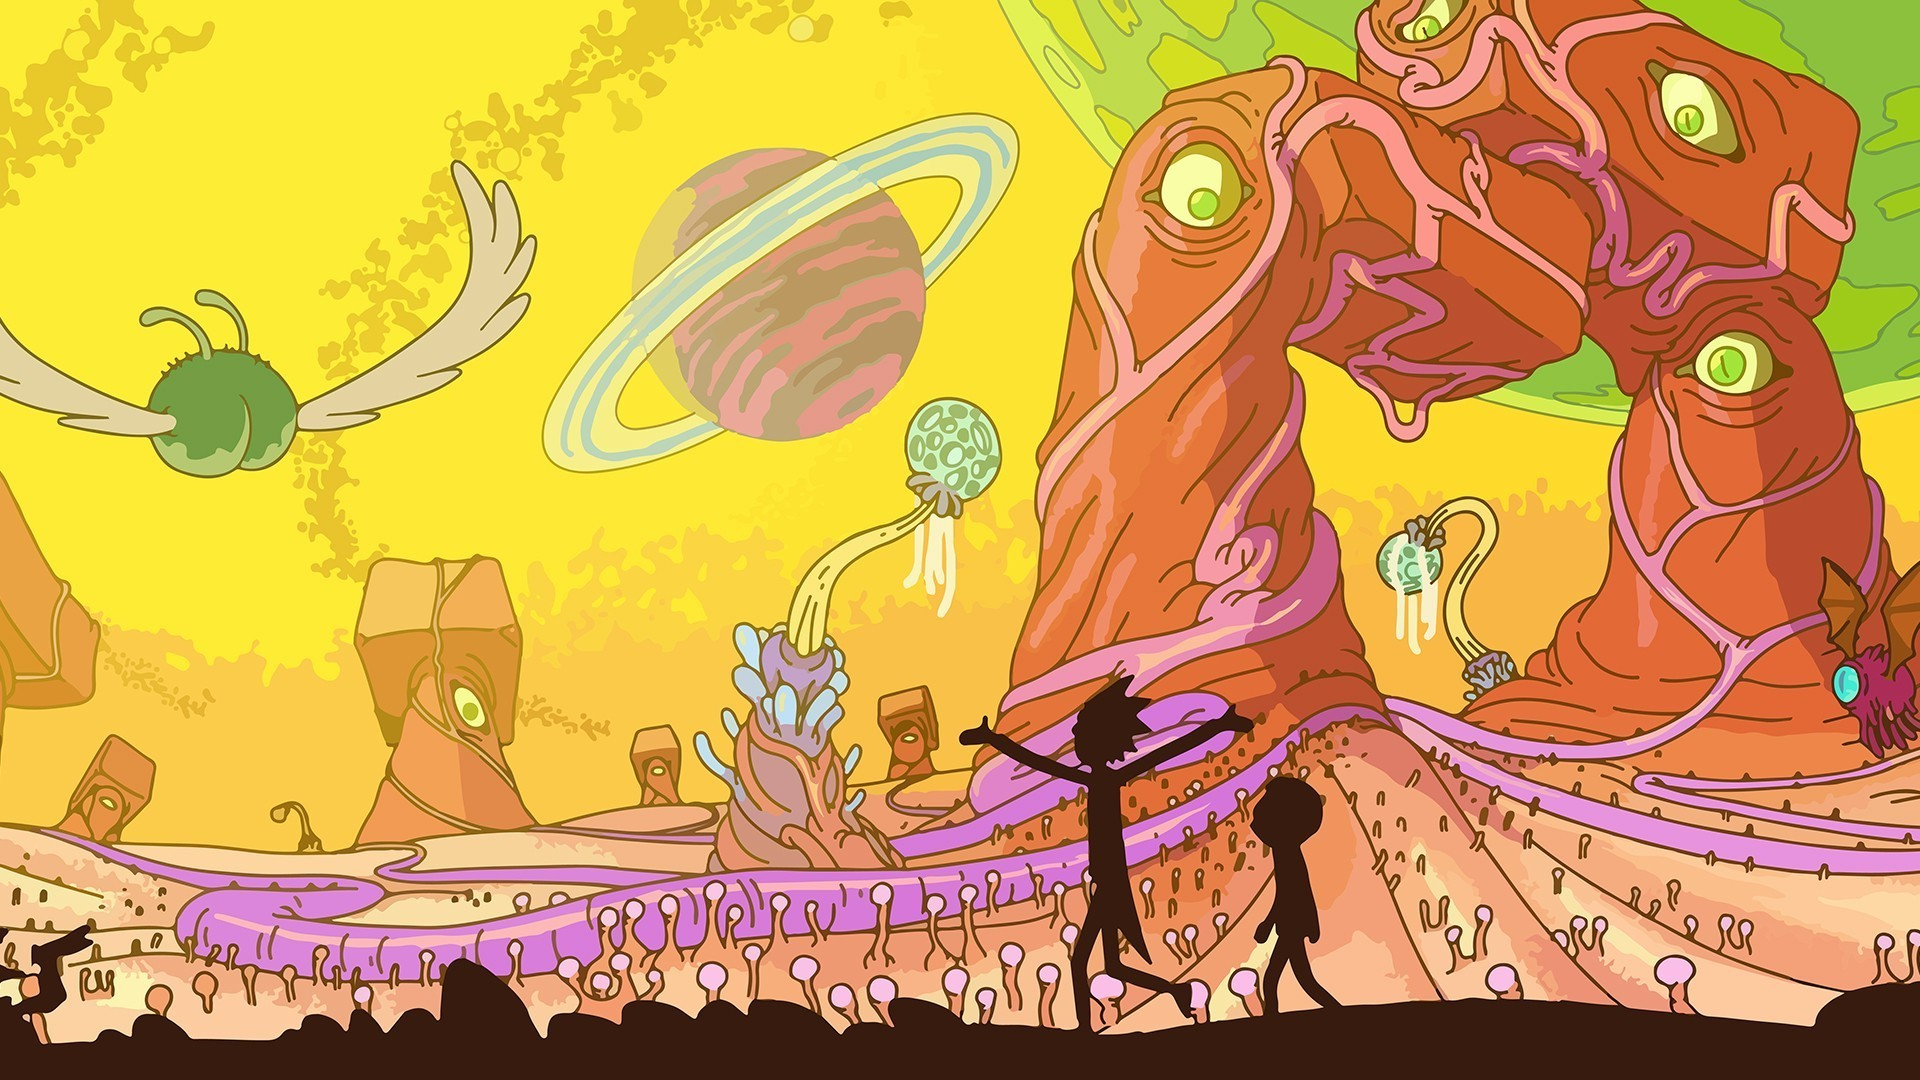 Gravity Falls Wallpaper Ipad Rick And Morty Wallpaper 1920x1080 183 ① Download Free